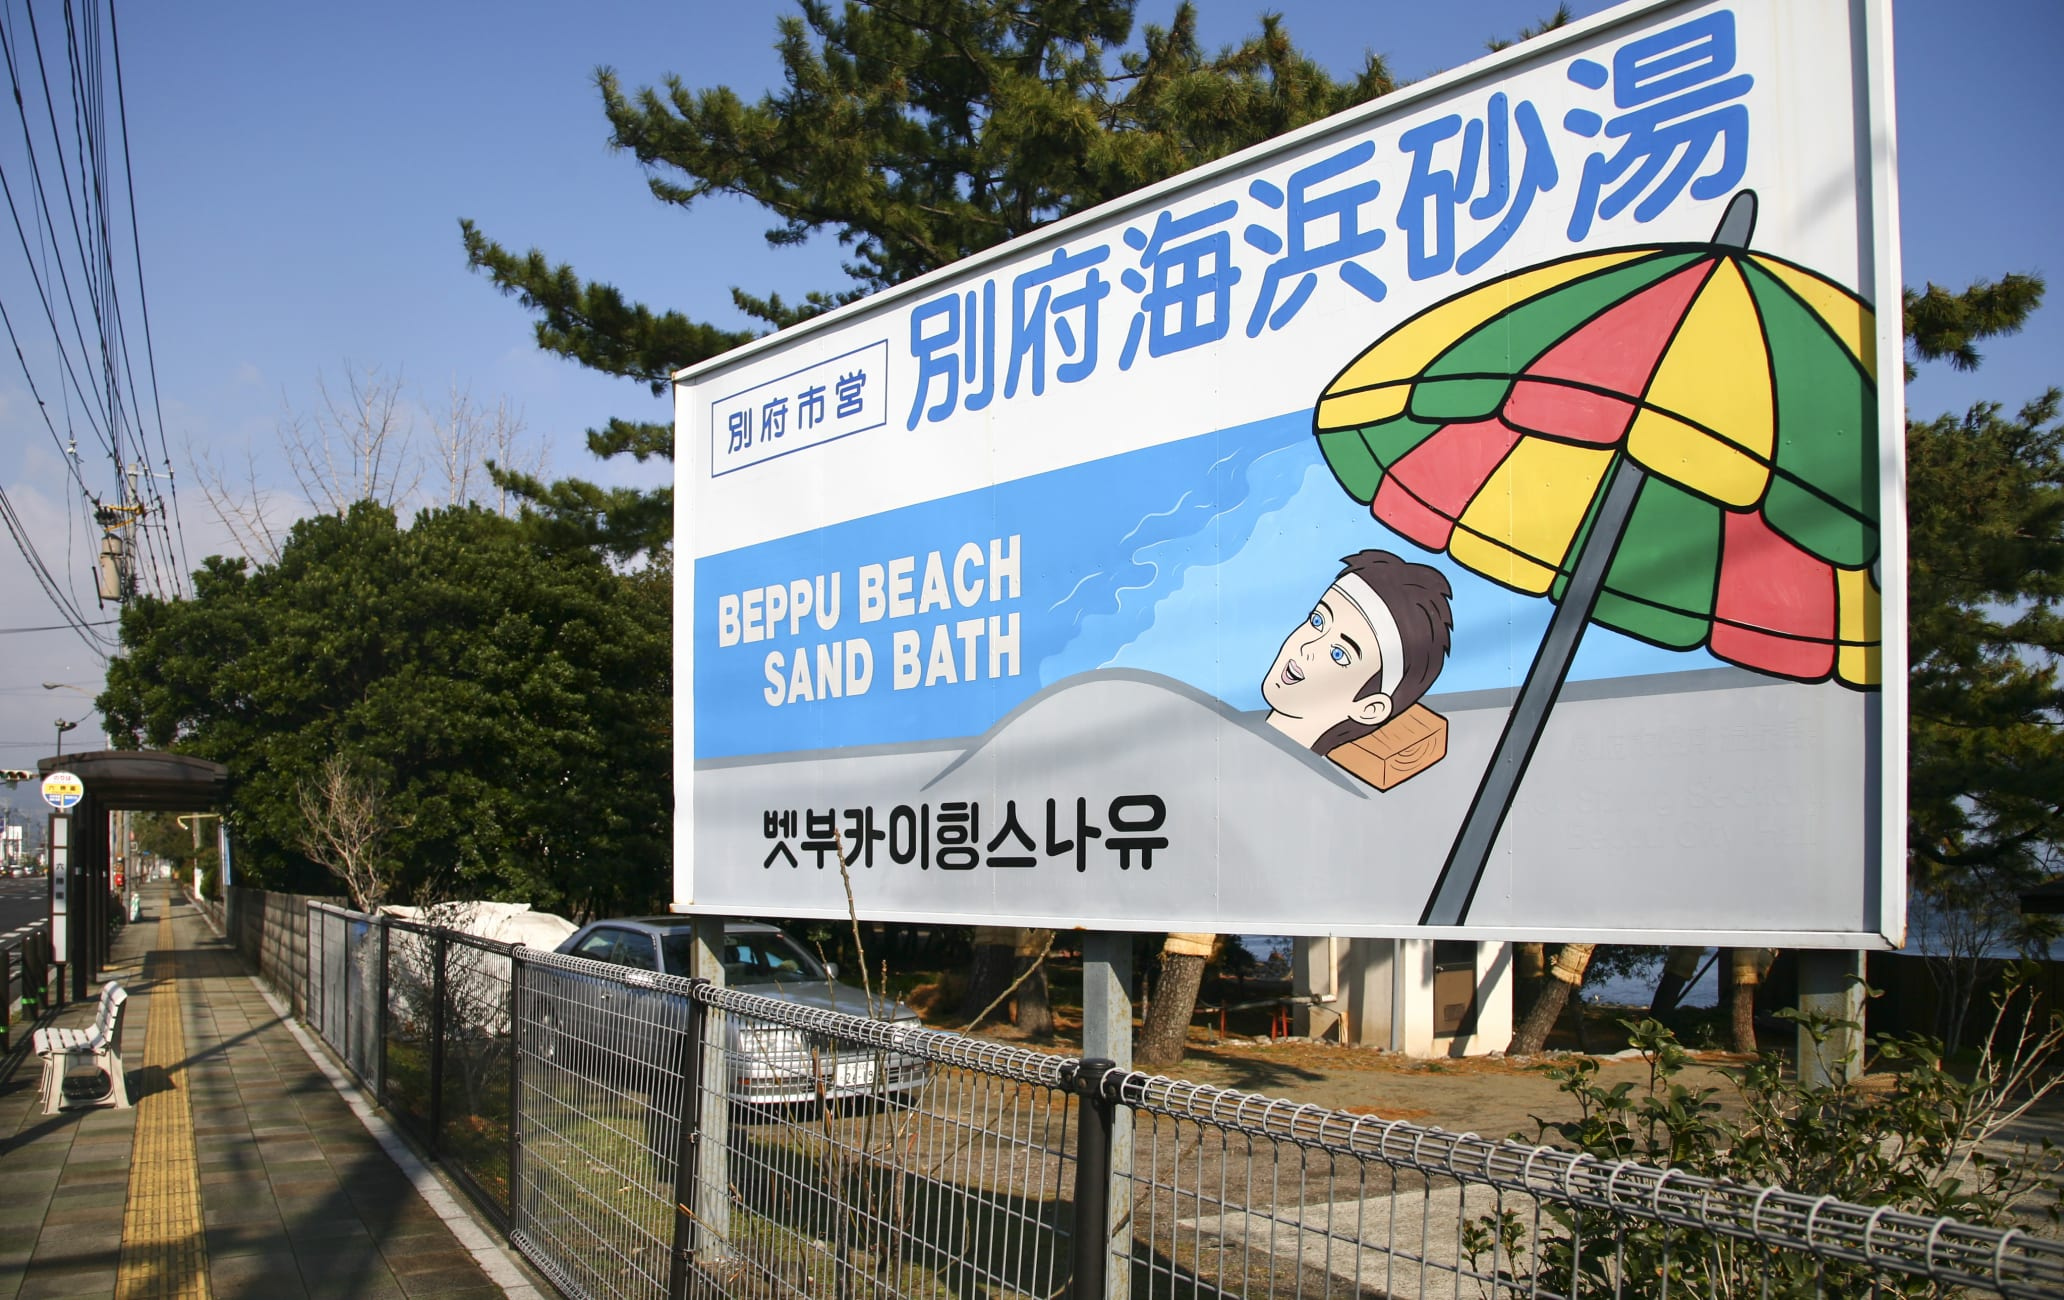 Beppu Beach Sand Bath Municipal Hot Springs